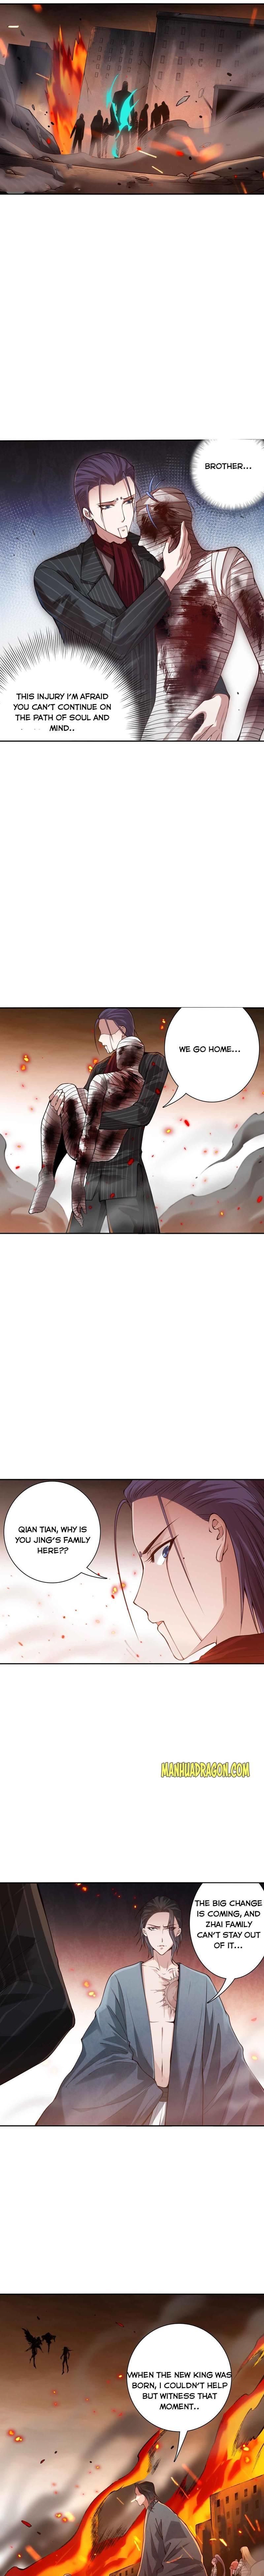 Ultimate Soldier Chapter 119 page 4 - Mangakakalots.com